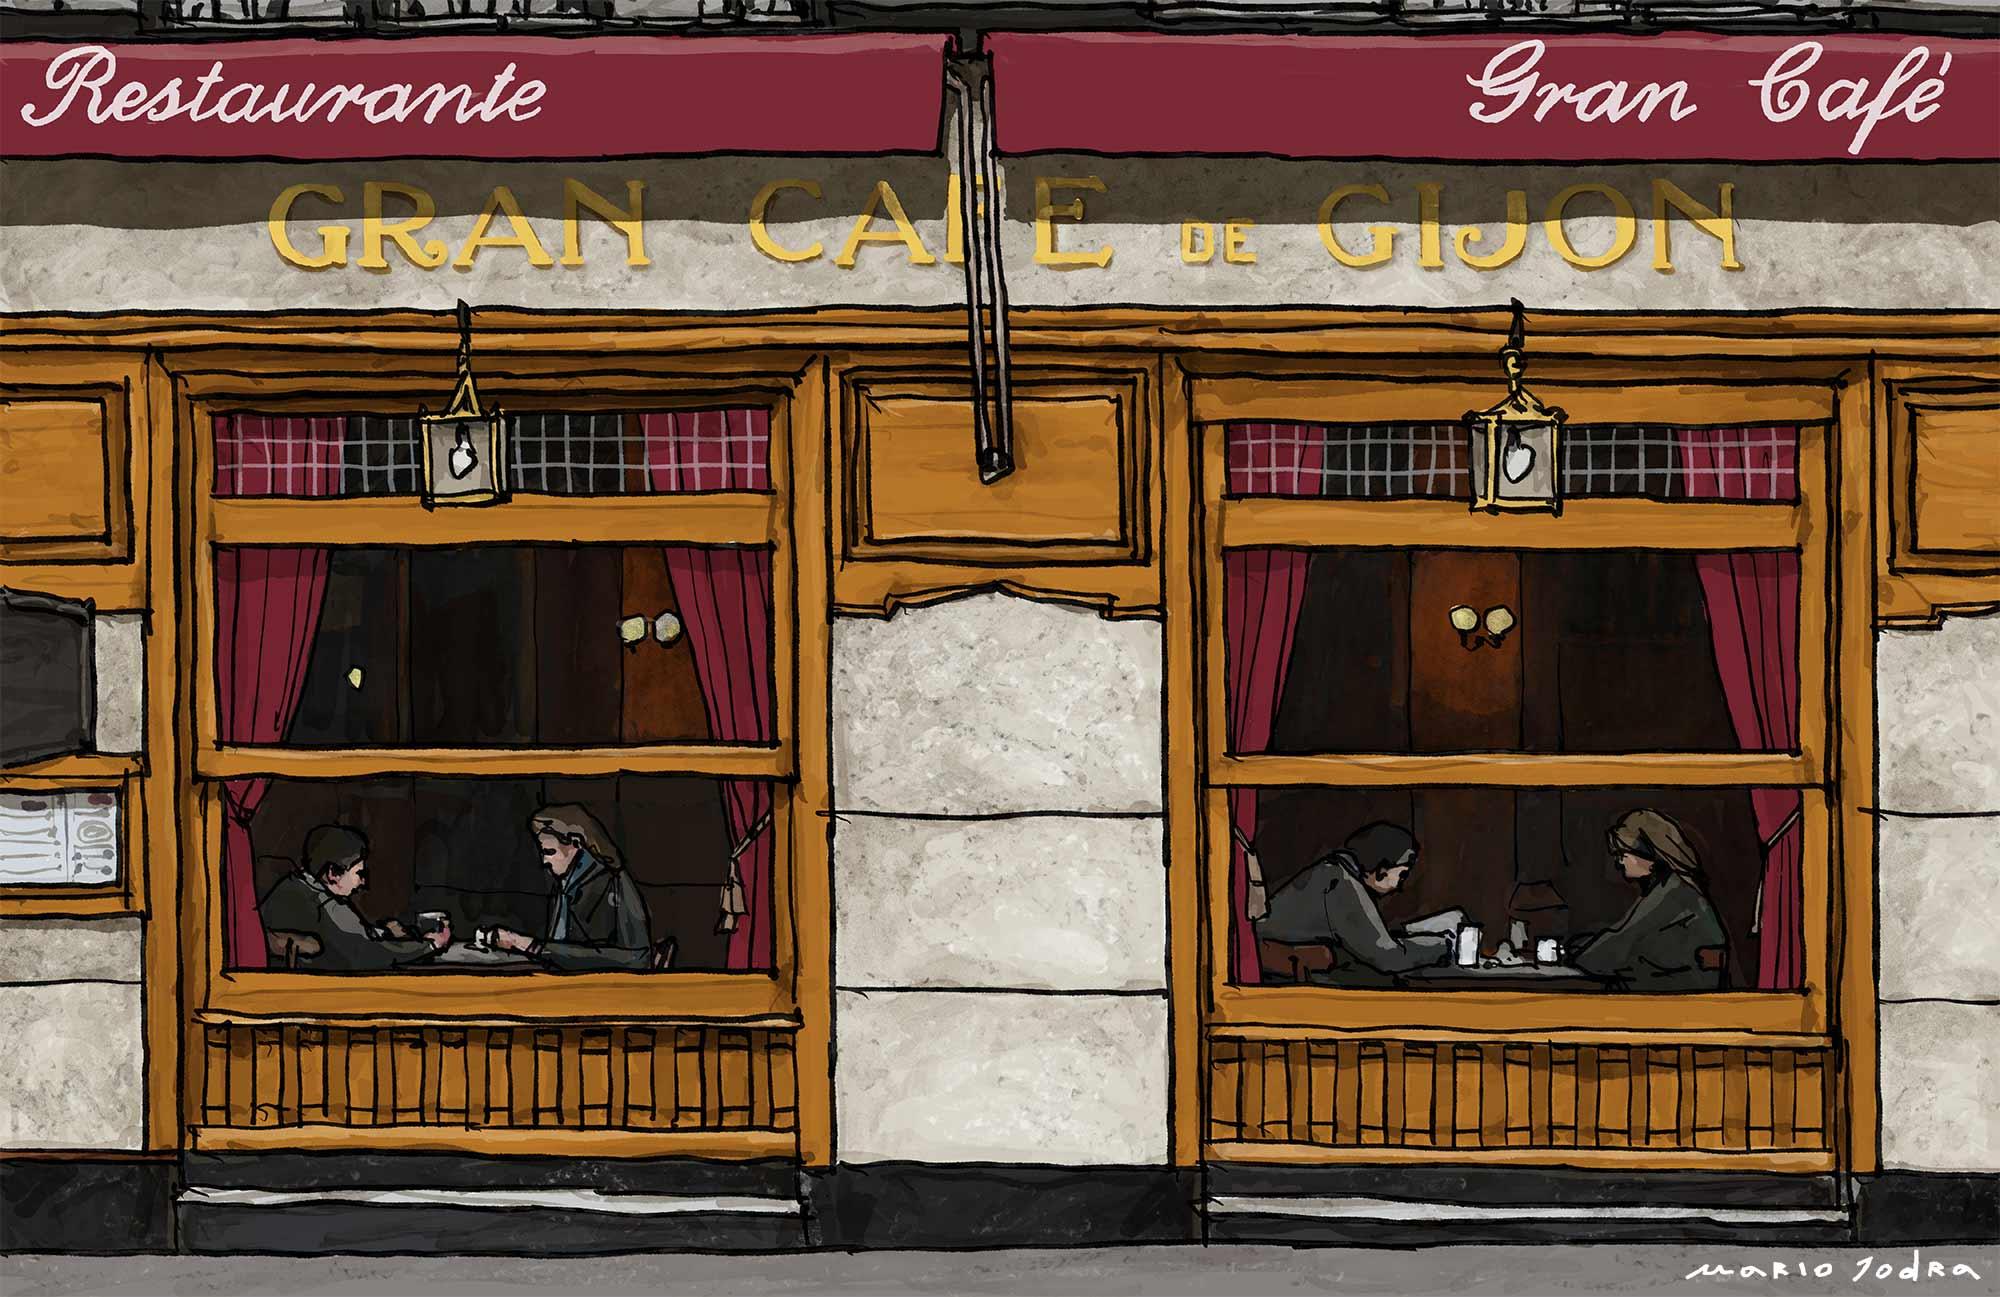 Mario Jodra illustration Art - Café Gijón. Madrid tavern. Since 1888